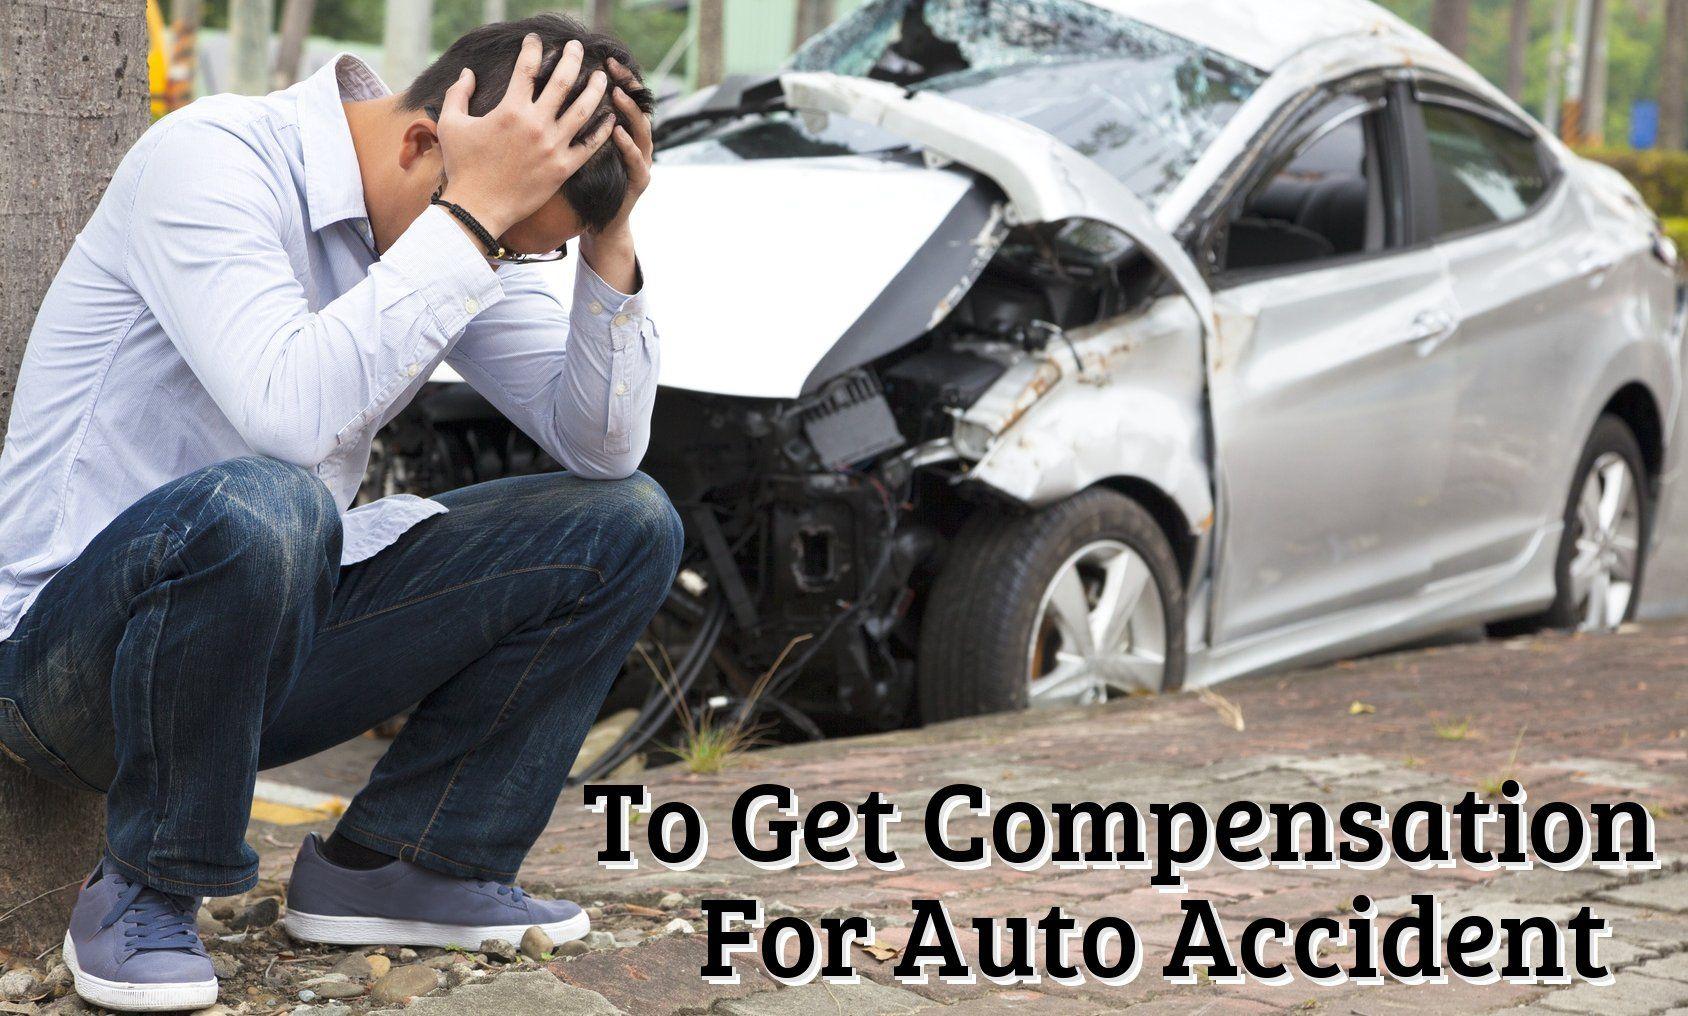 New York Auto Accident Attorney Car Accident Injuries Accident Injury Accident Attorney